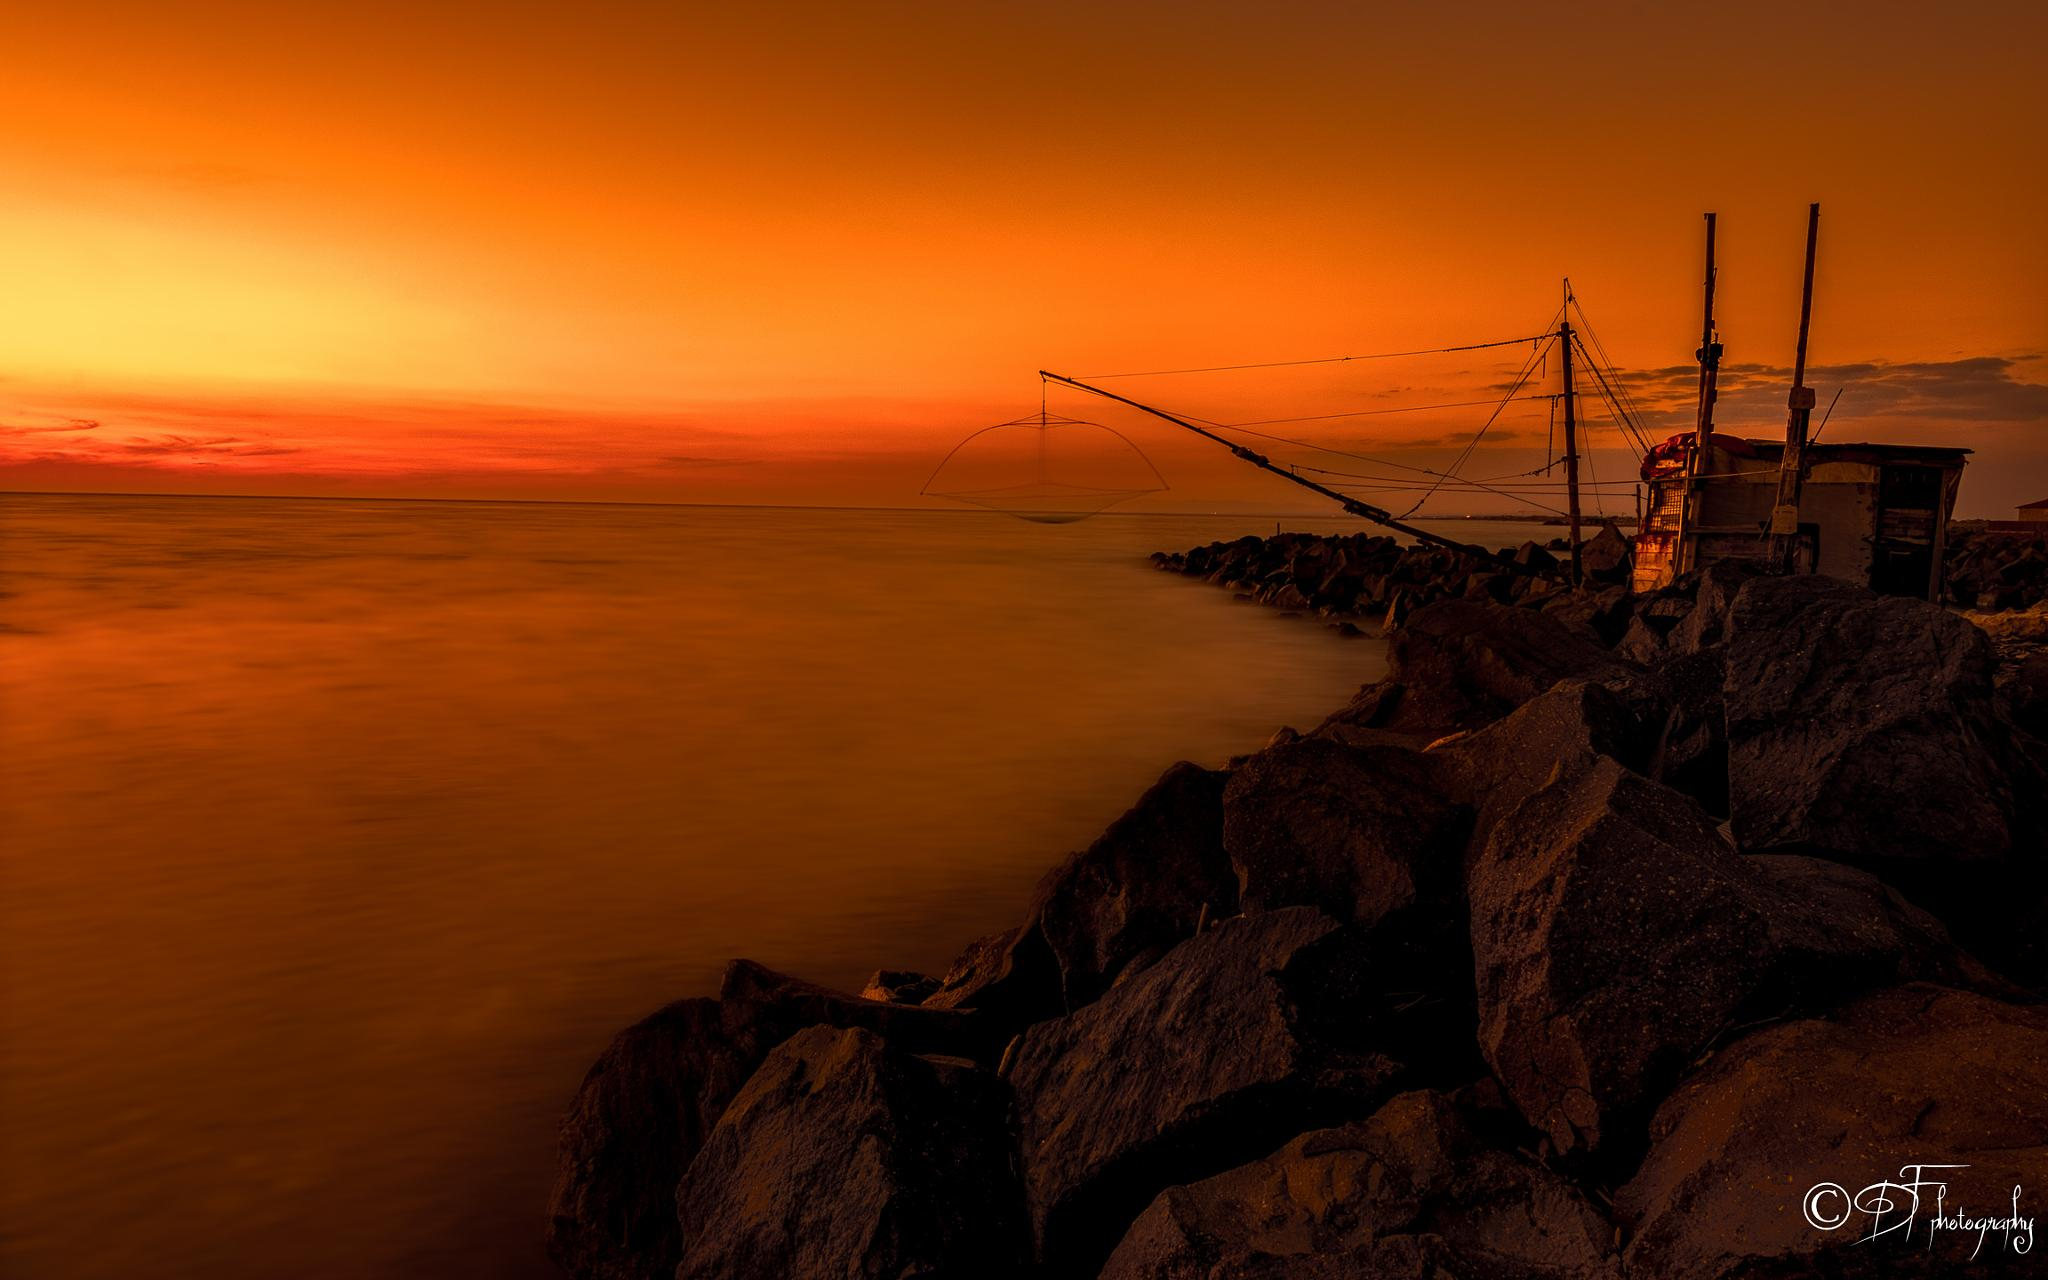 Sunset on the tyrrhenian sea by DANIEL F